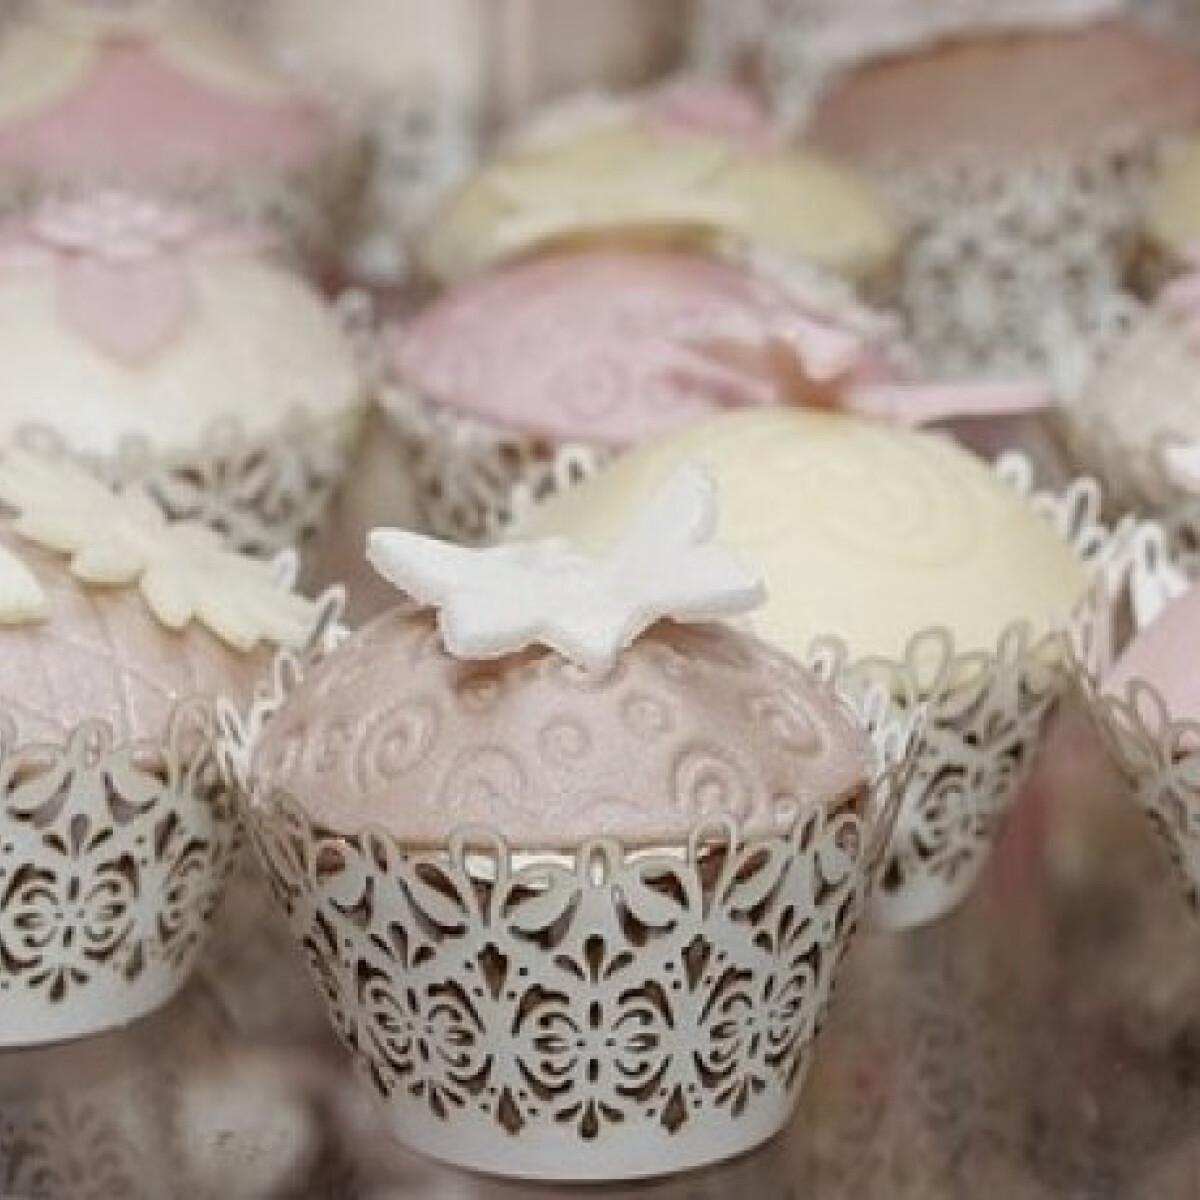 Ezen a képen: Cupcake - mini torták muffinból